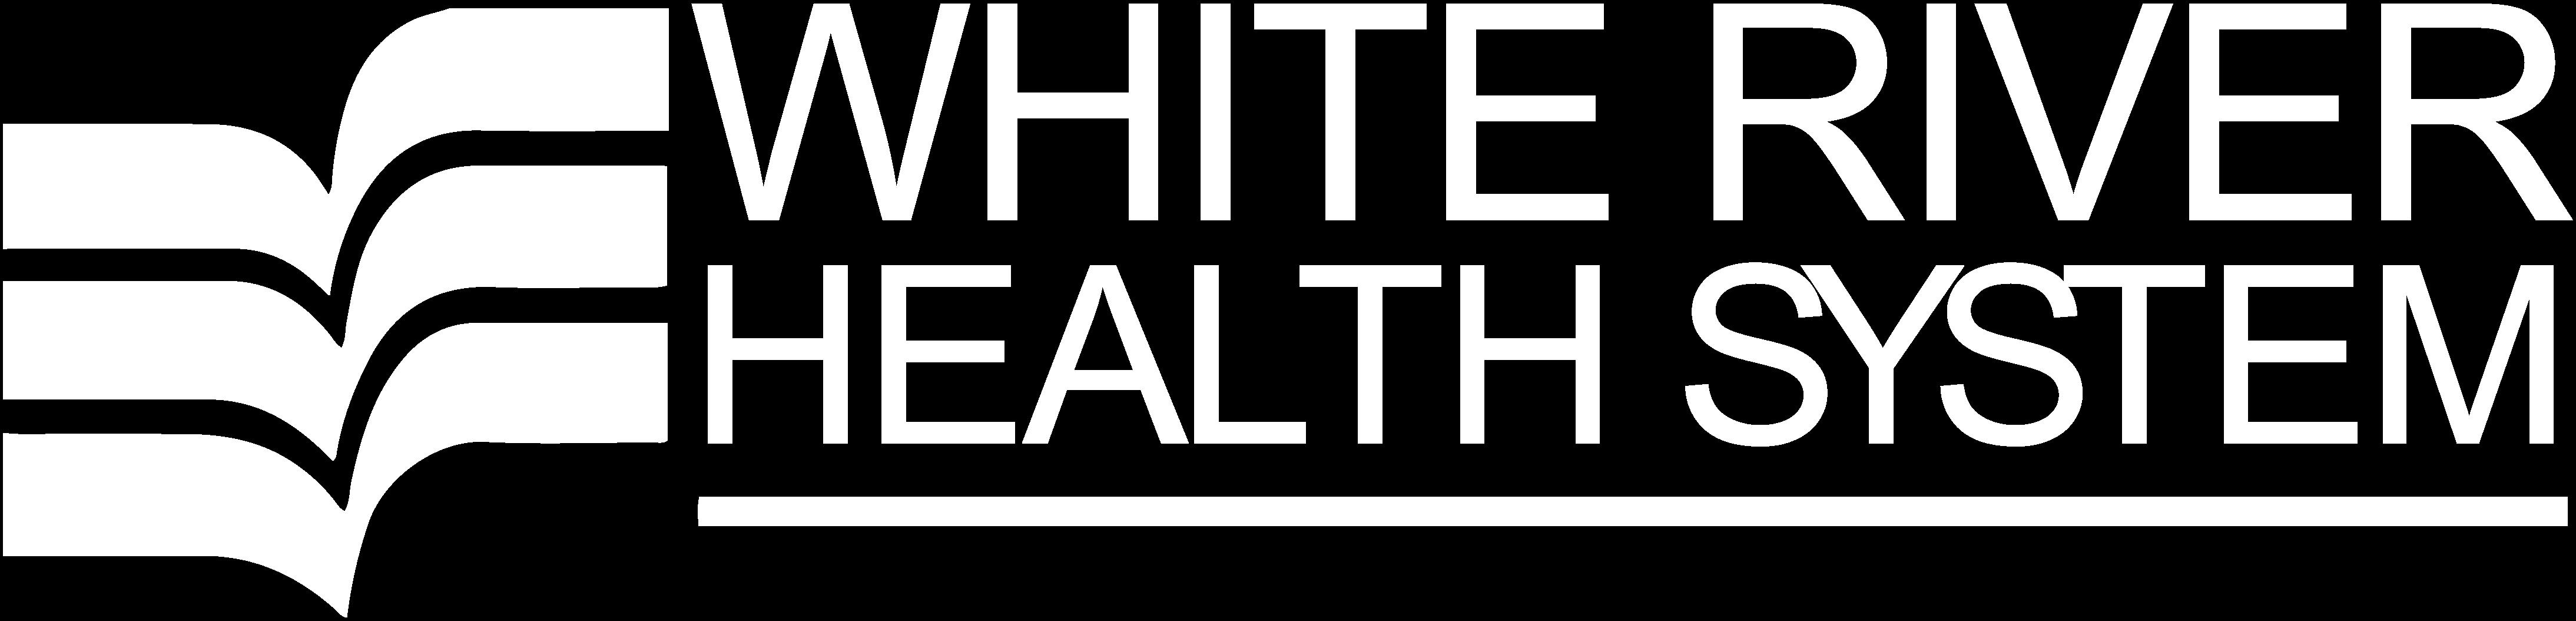 white river health system